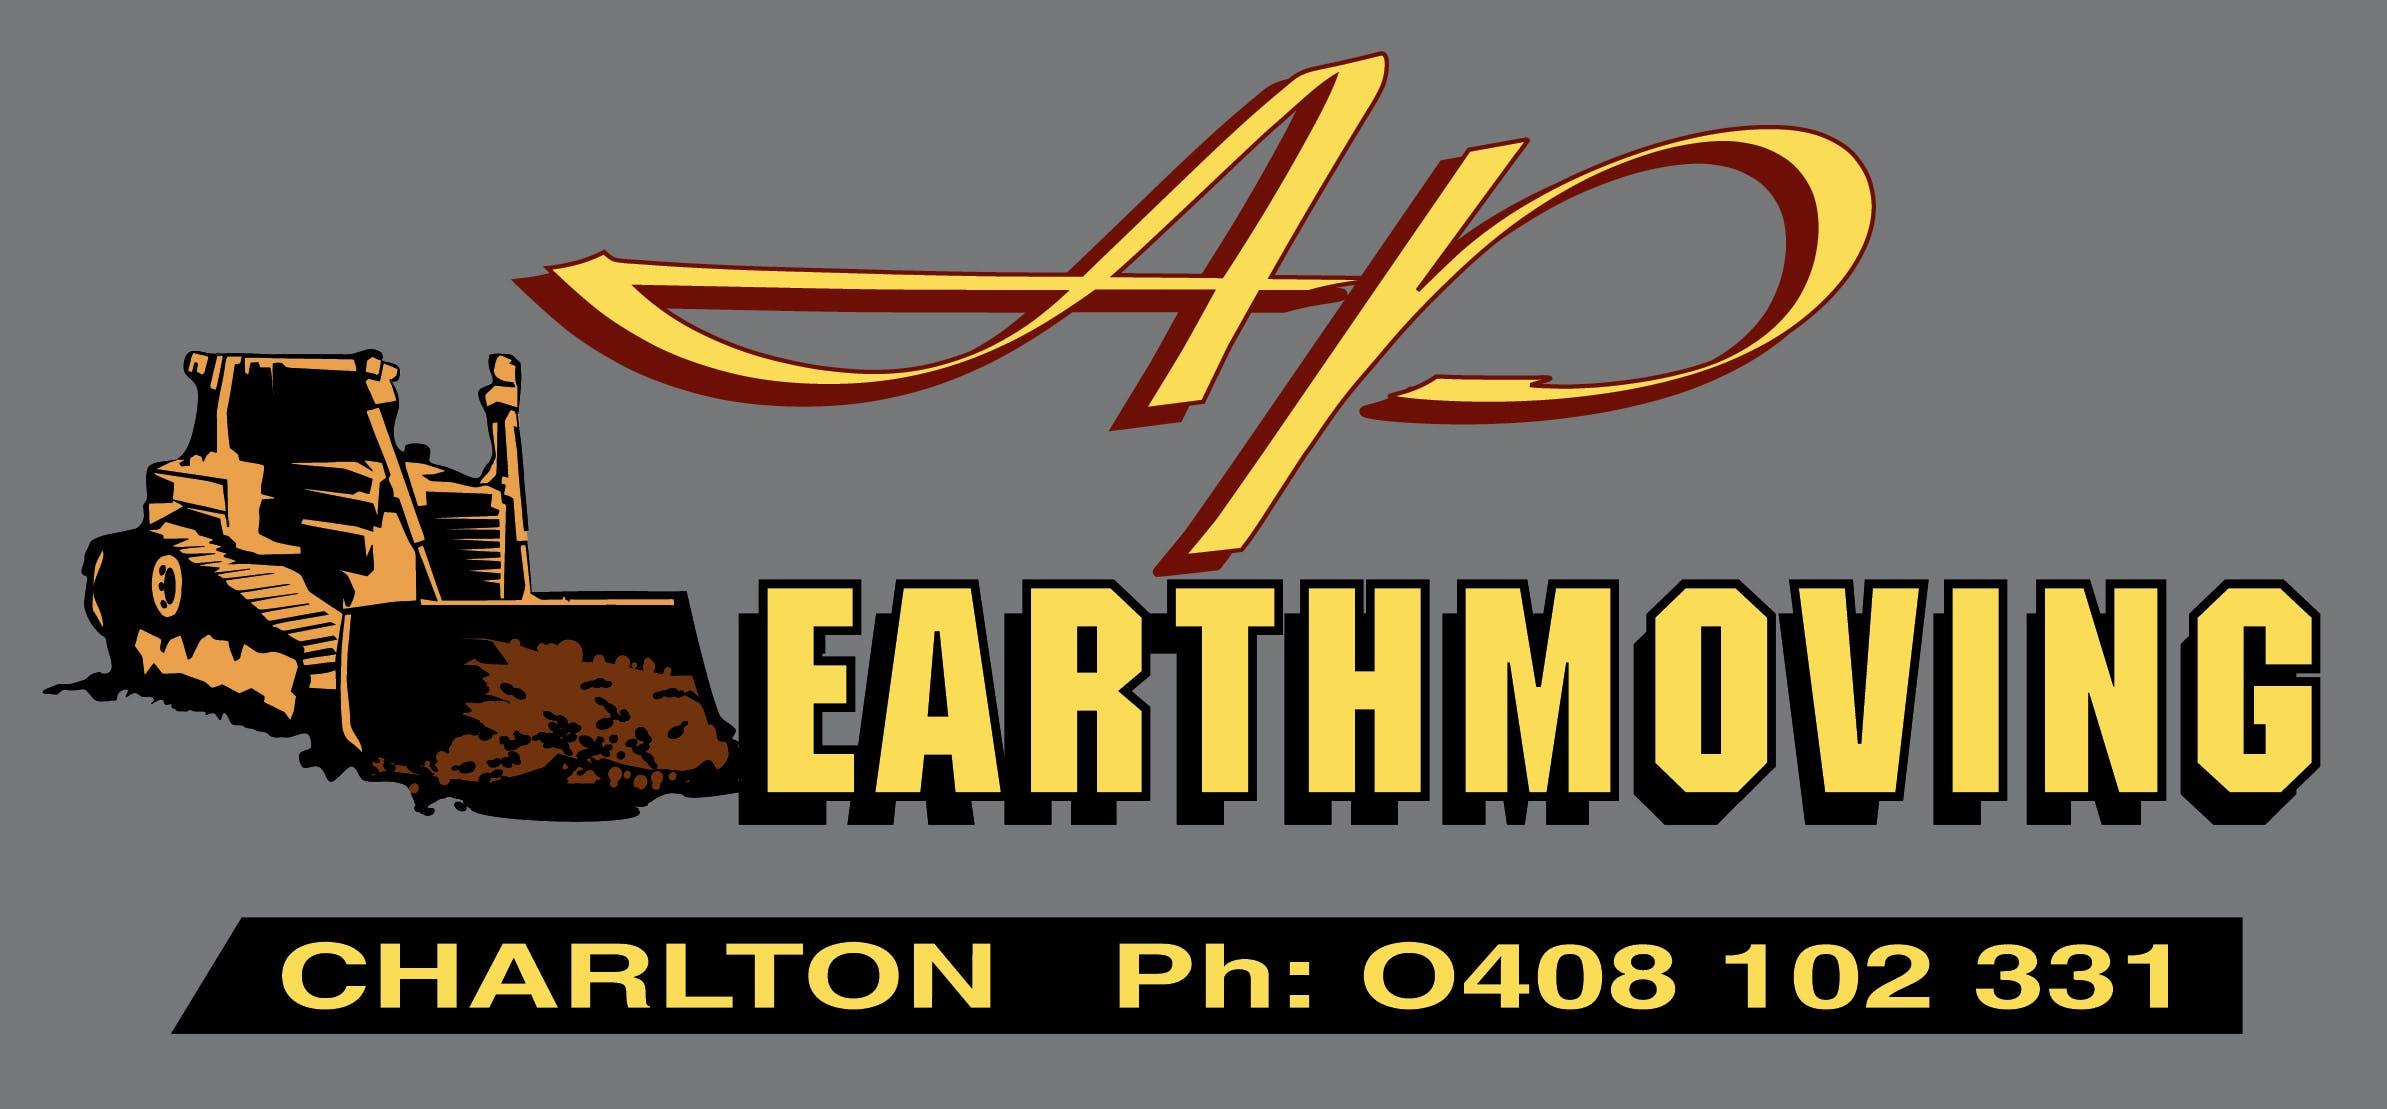 AP Earthmoving Pty Ltd